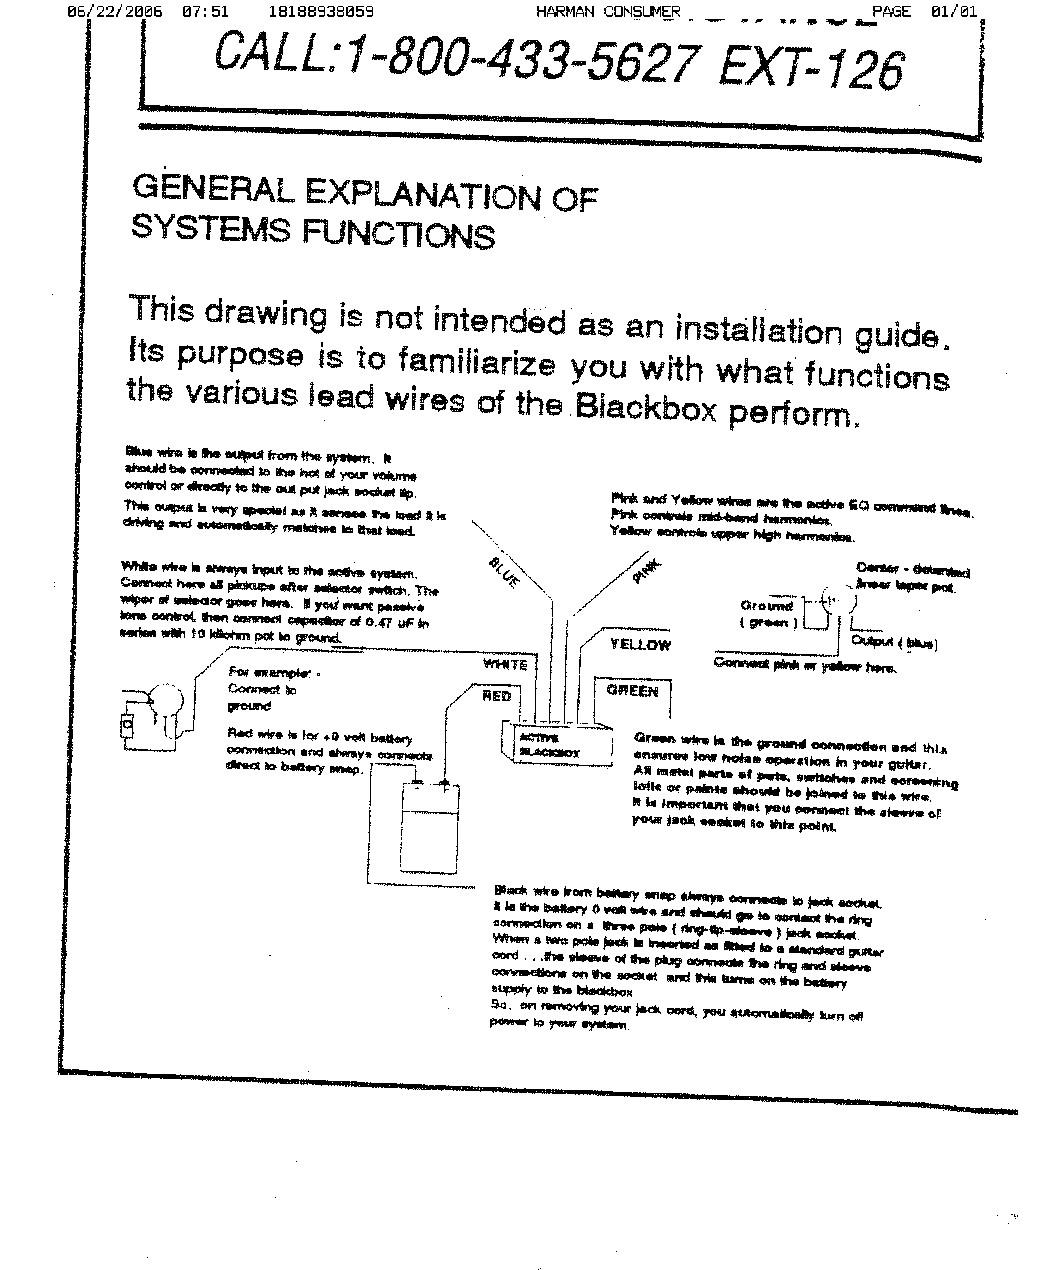 Reflexpickupinstructions03